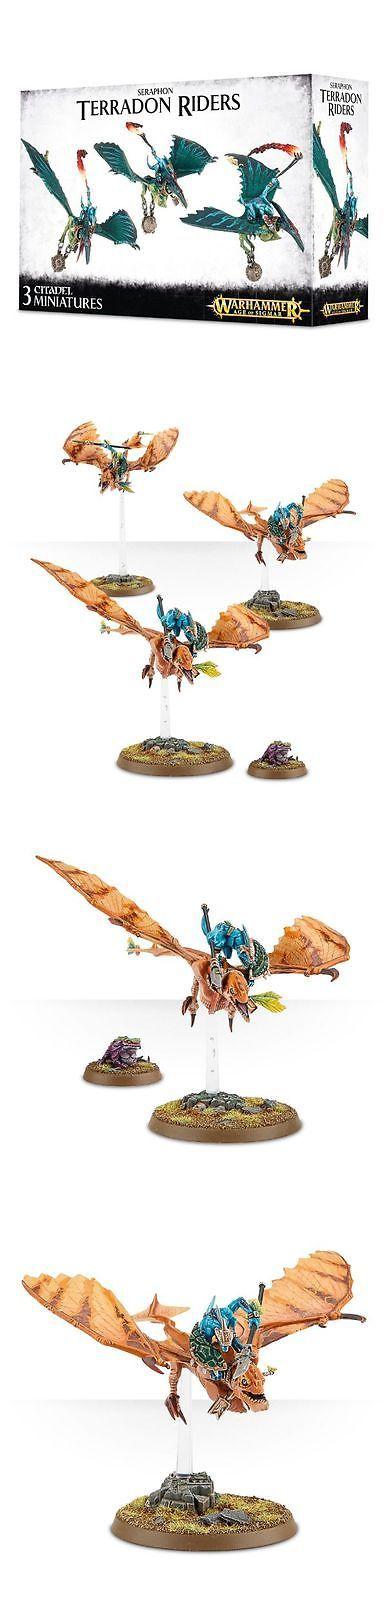 WFB Miniatures 183475: Seraphon Terradon Riders Ripperdactyl Lizardmen Warhammer Age Of Sigmar New -> BUY IT NOW ONLY: $51 on eBay!